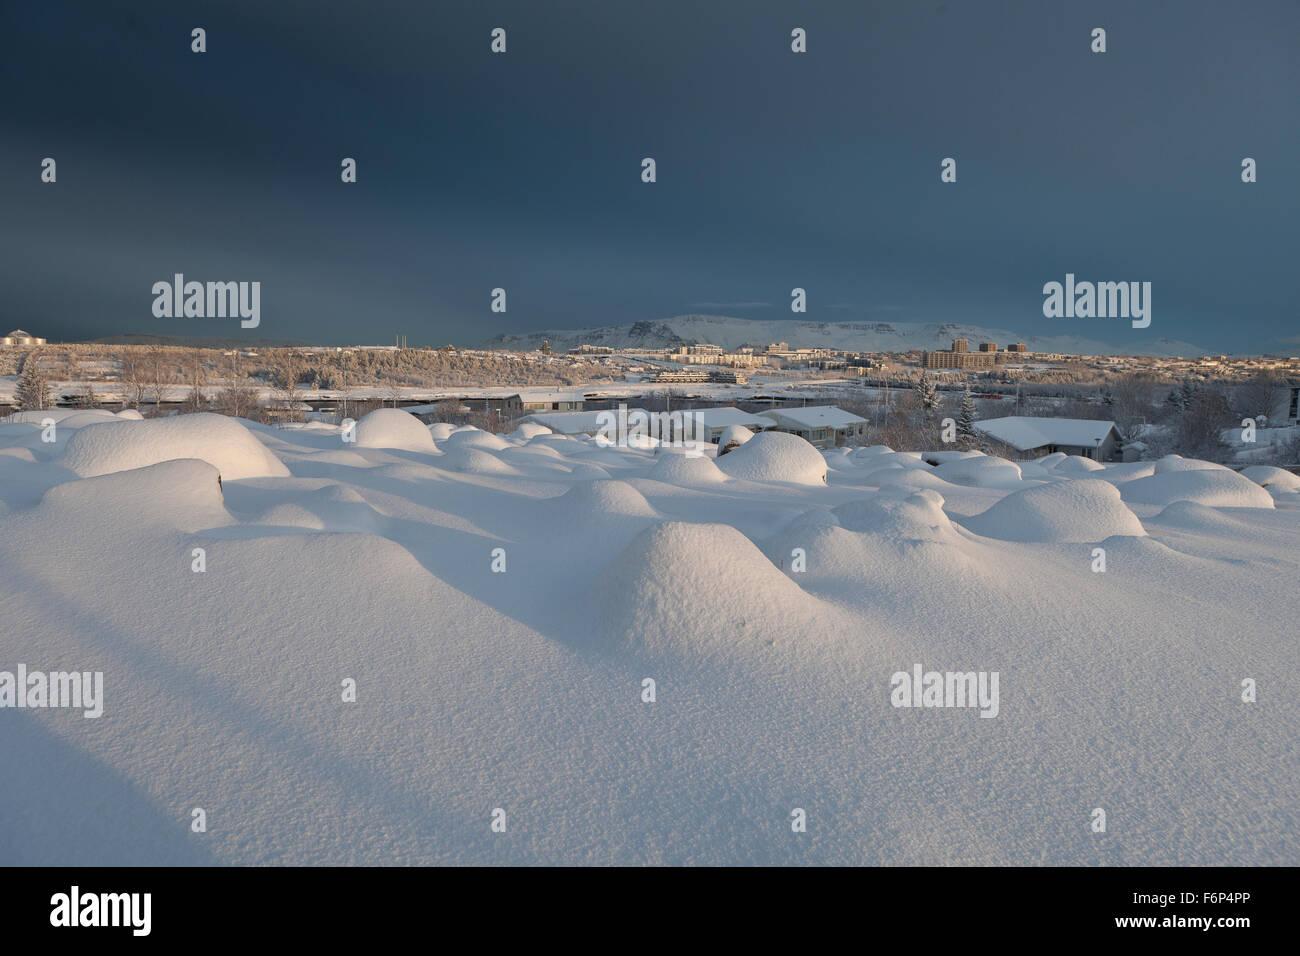 Aftermath of snowstorm, Reykjavik, Iceland - Stock Image